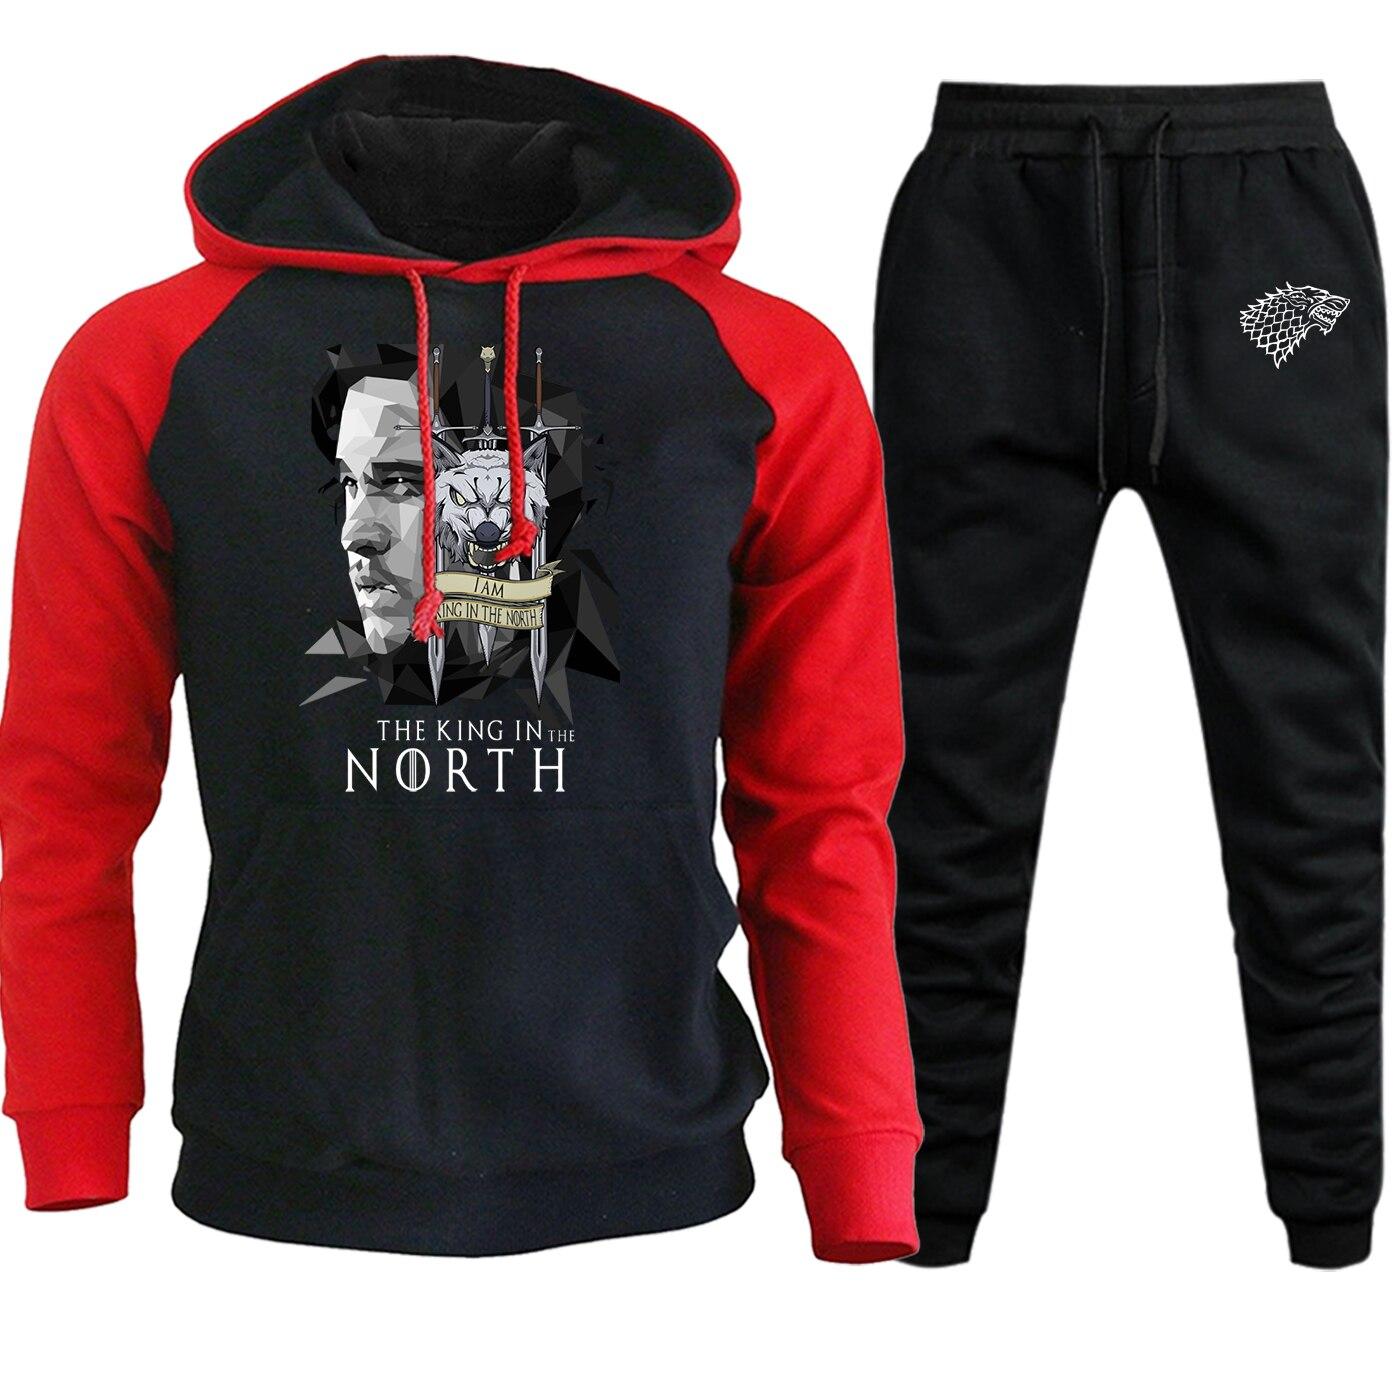 King In The North 2019 Autumn Winter Hooded Mens Raglan Sweatshirts Game Of Thrones Suit Casual Fleece Hoodies+Pants 2 Piece Set